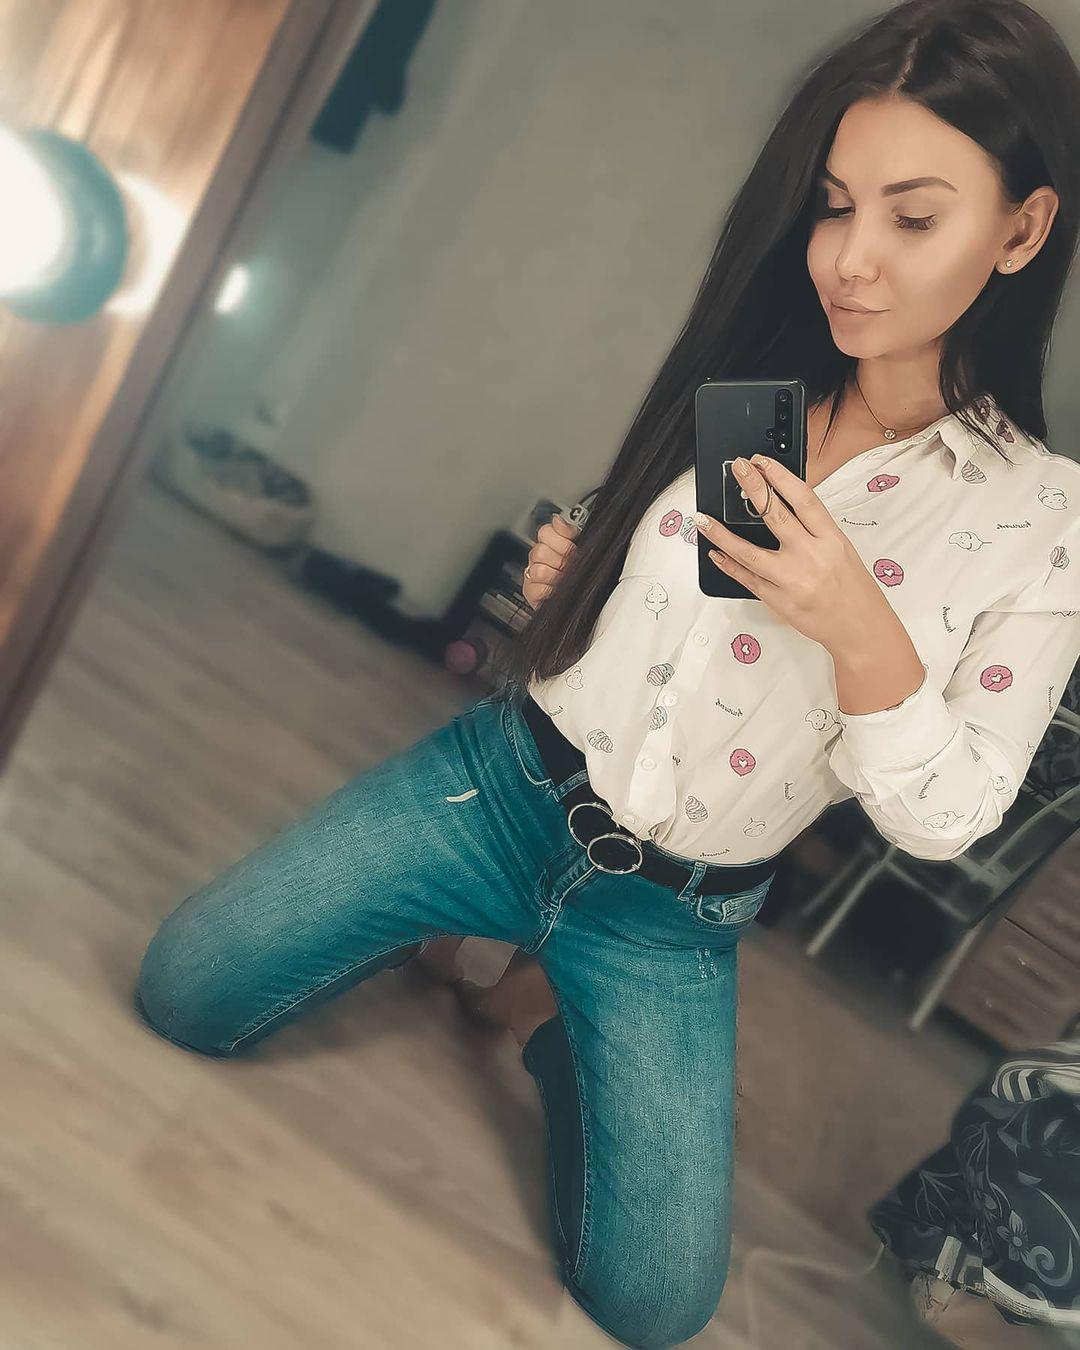 Anastasia-Nikolskaya-Wallpapers-Insta-Fit-Bio-7